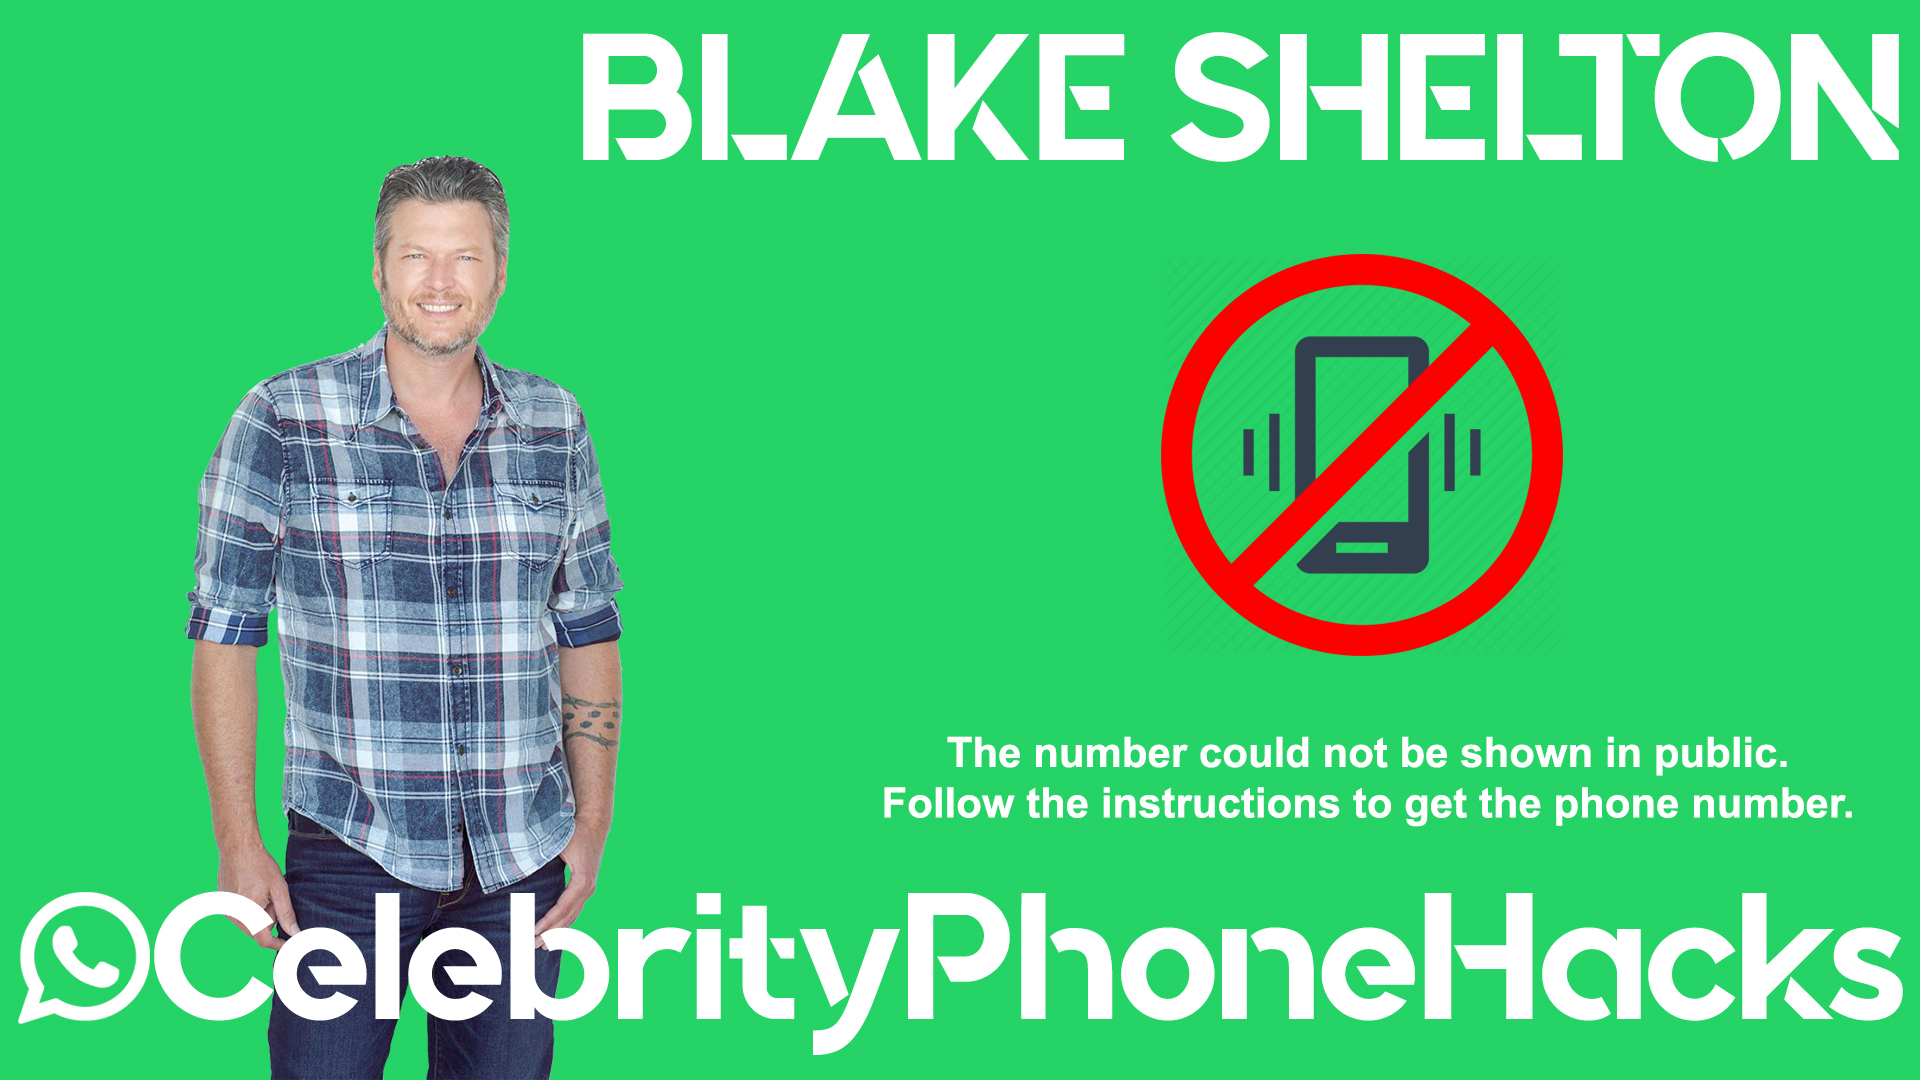 Blake Shelton real phone number 2019 whatsapp hacked leaked